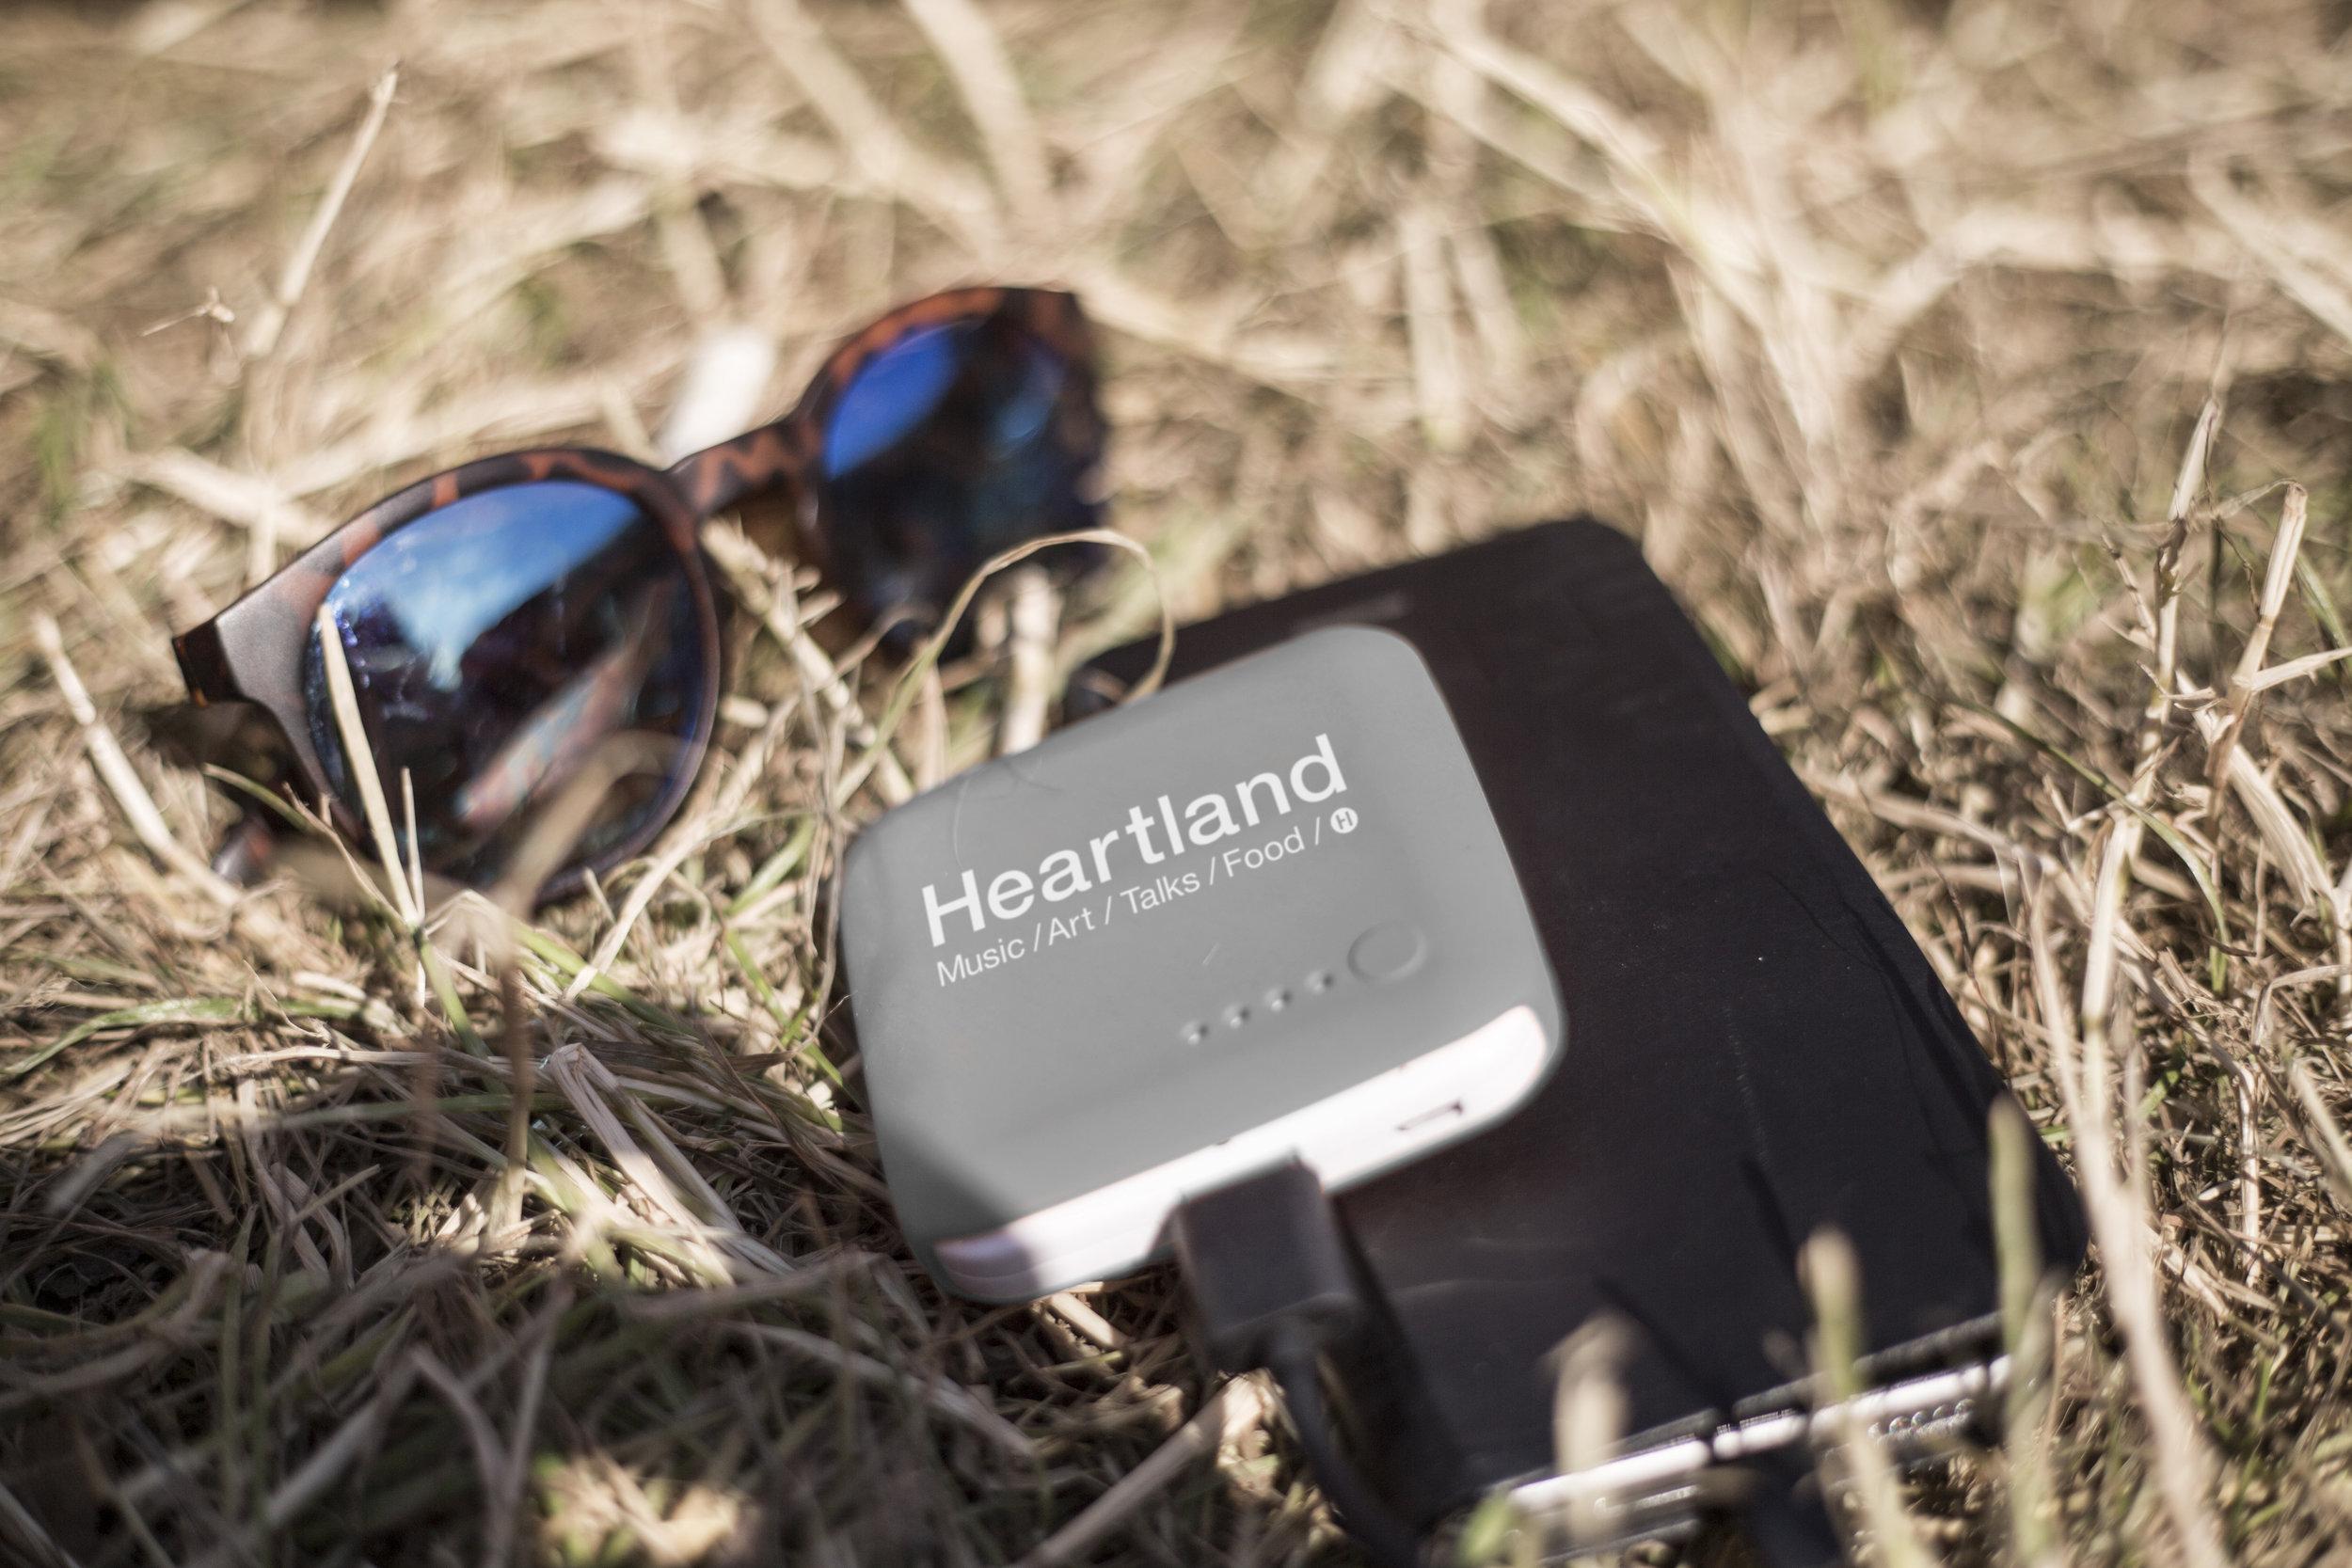 Heartland_Pic_03.jpg